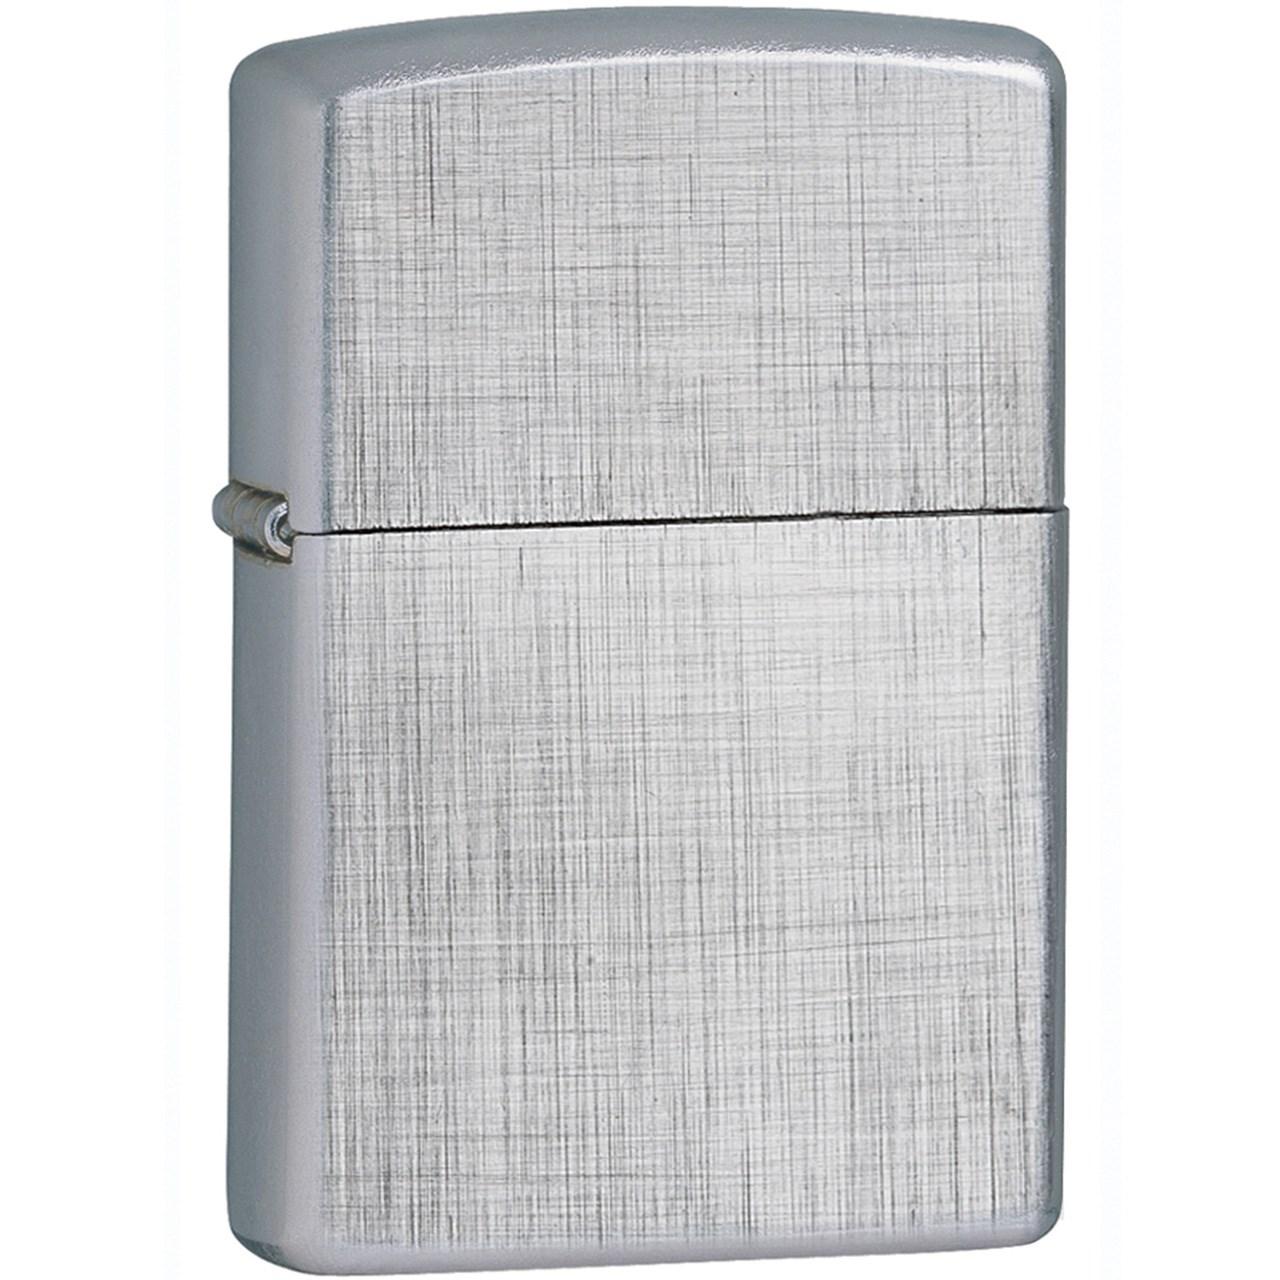 فندک زیپو مدل Linen Weave کد 28181